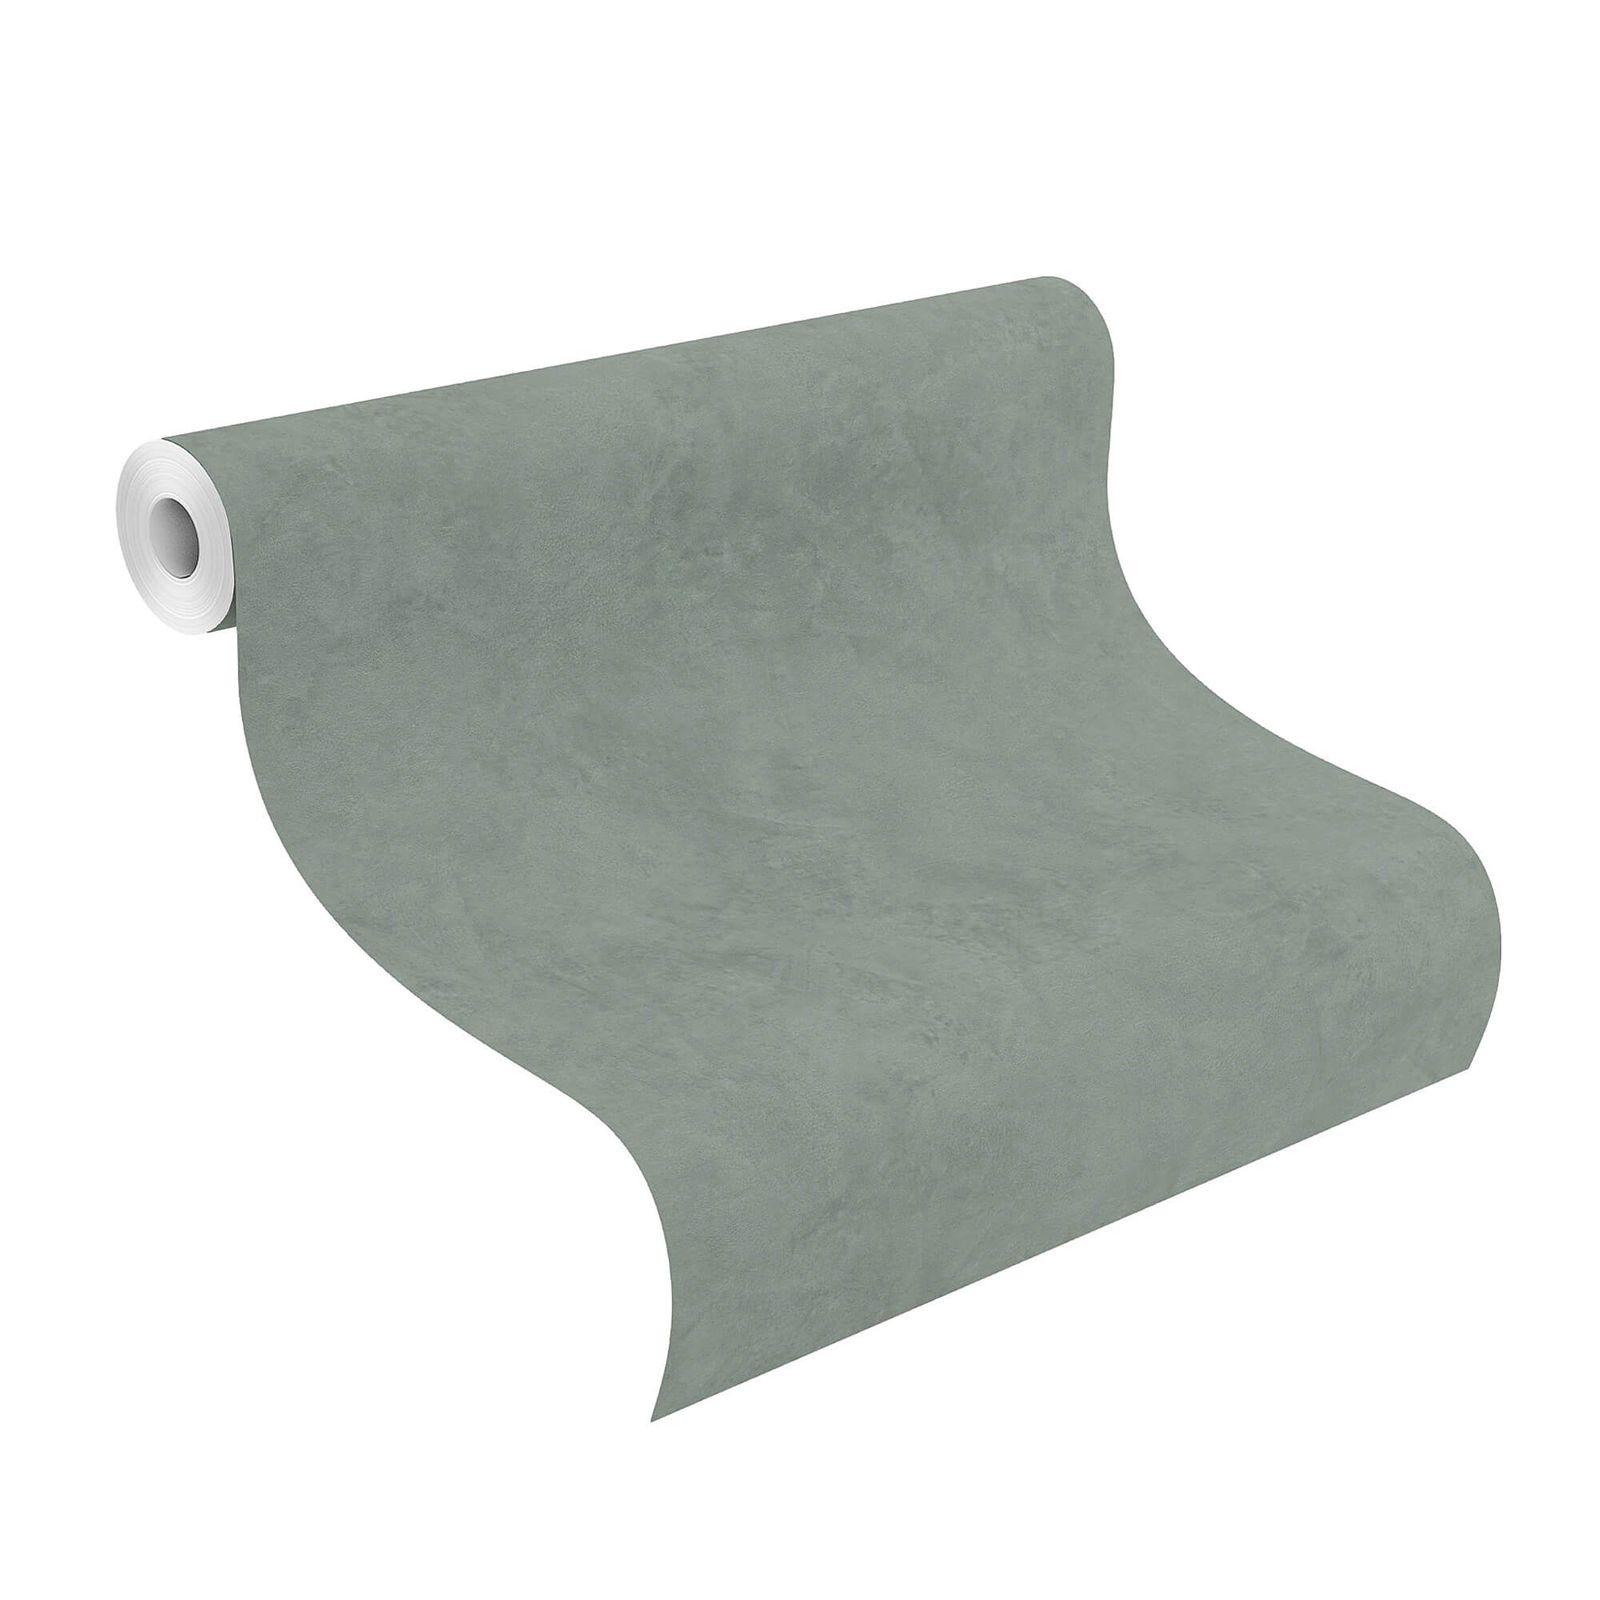 Vliestapete Rasch Beton-Optik Uni Grau-grün 426175